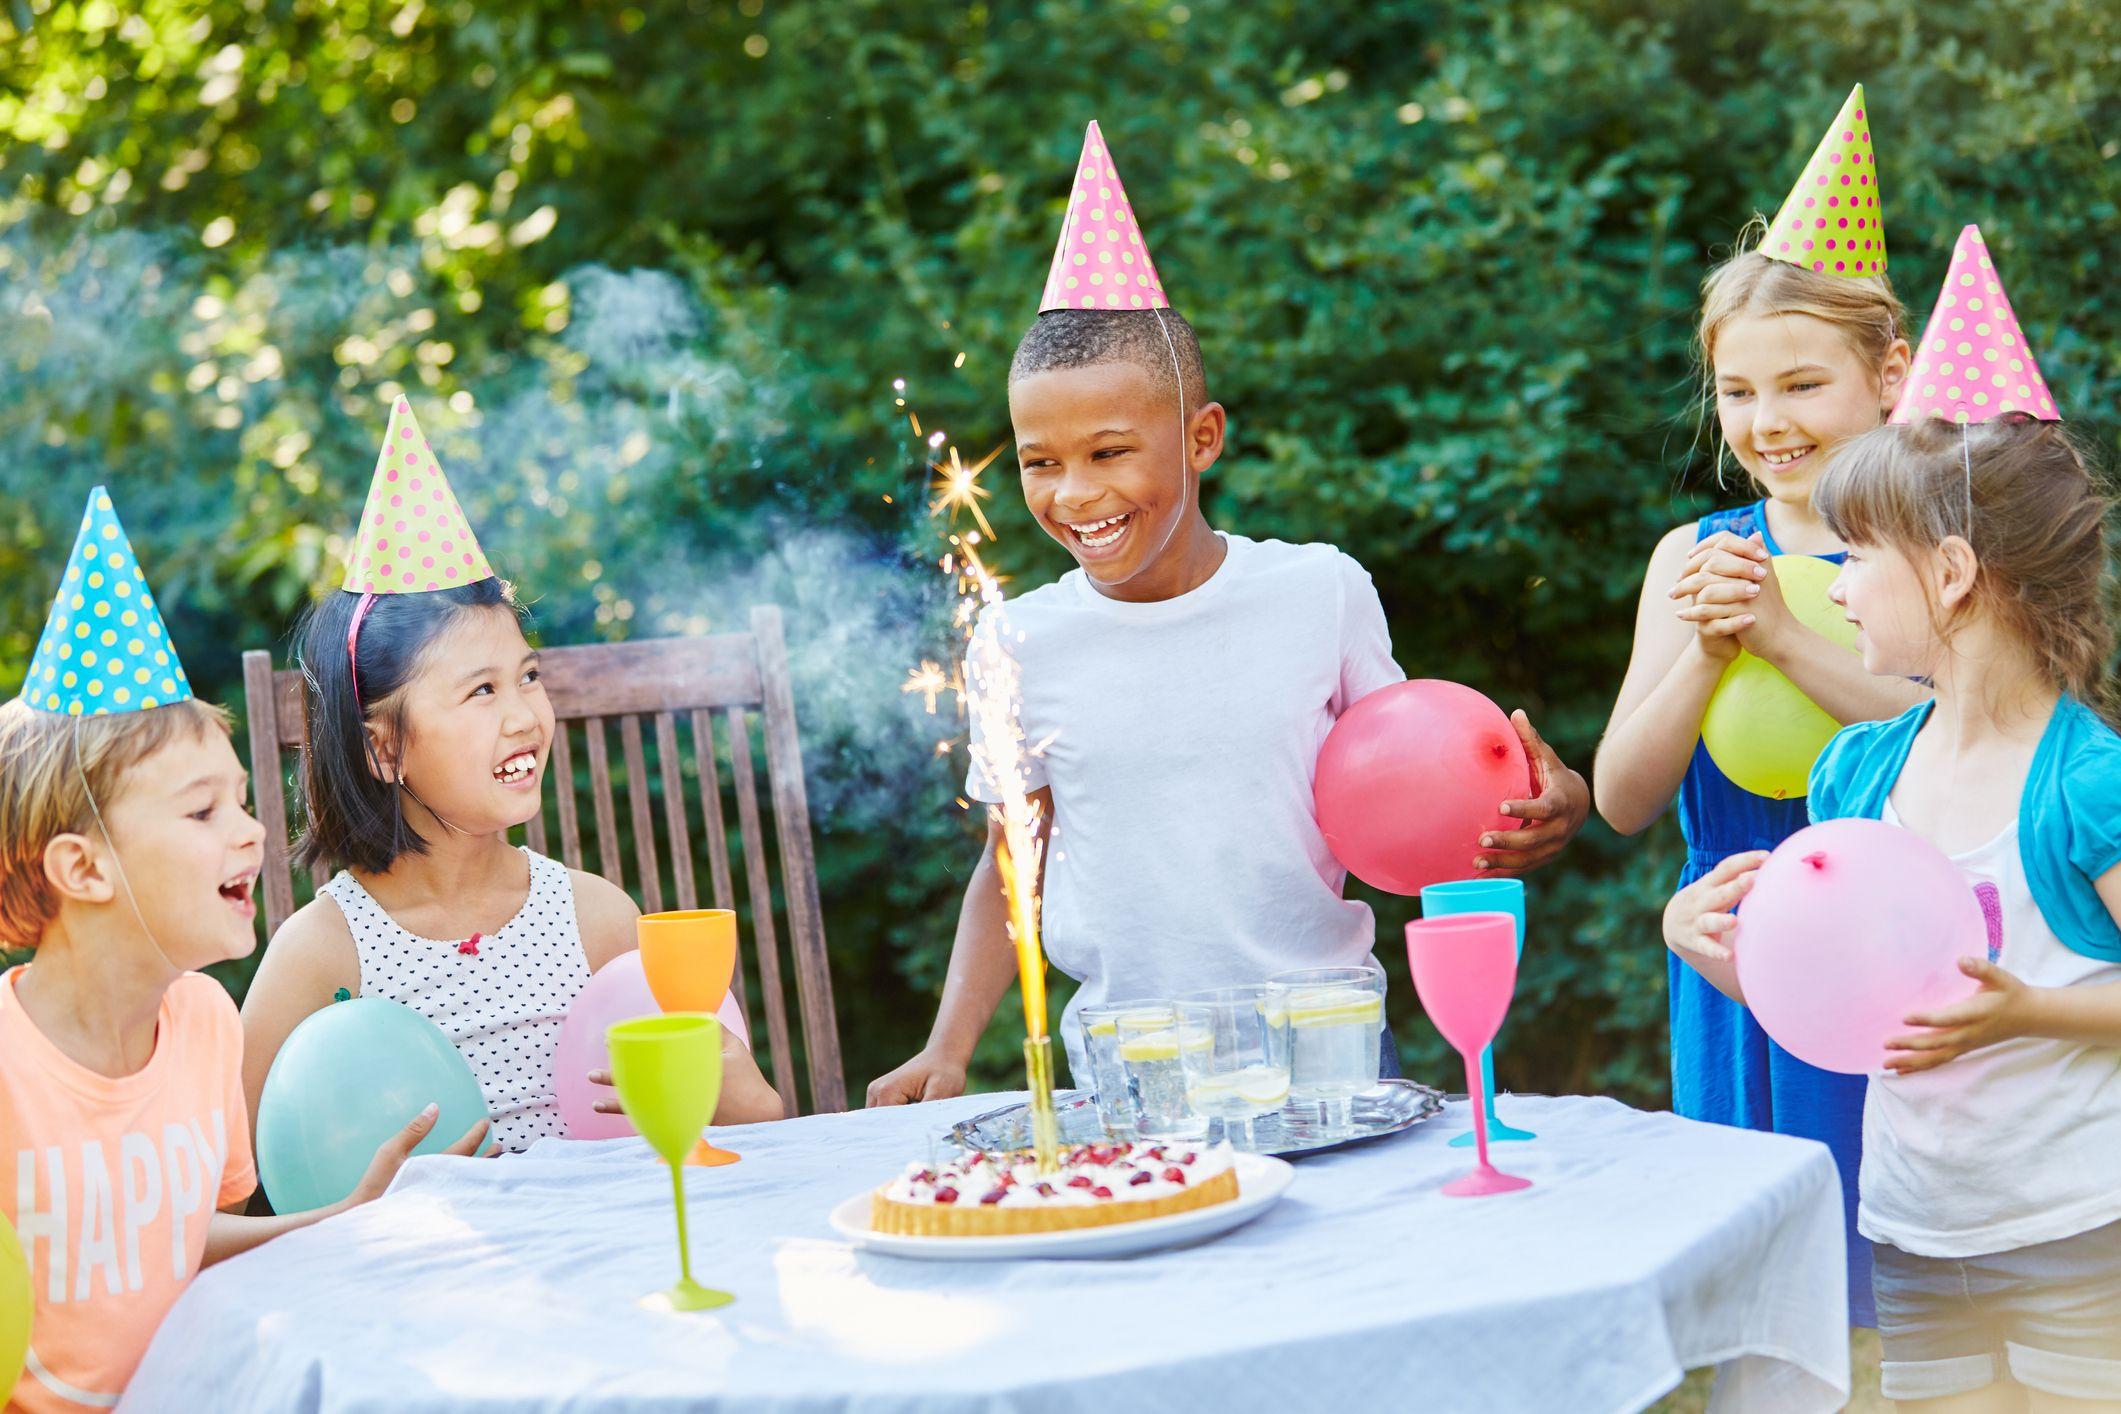 Kids celebrating at a zero waste birthday party.